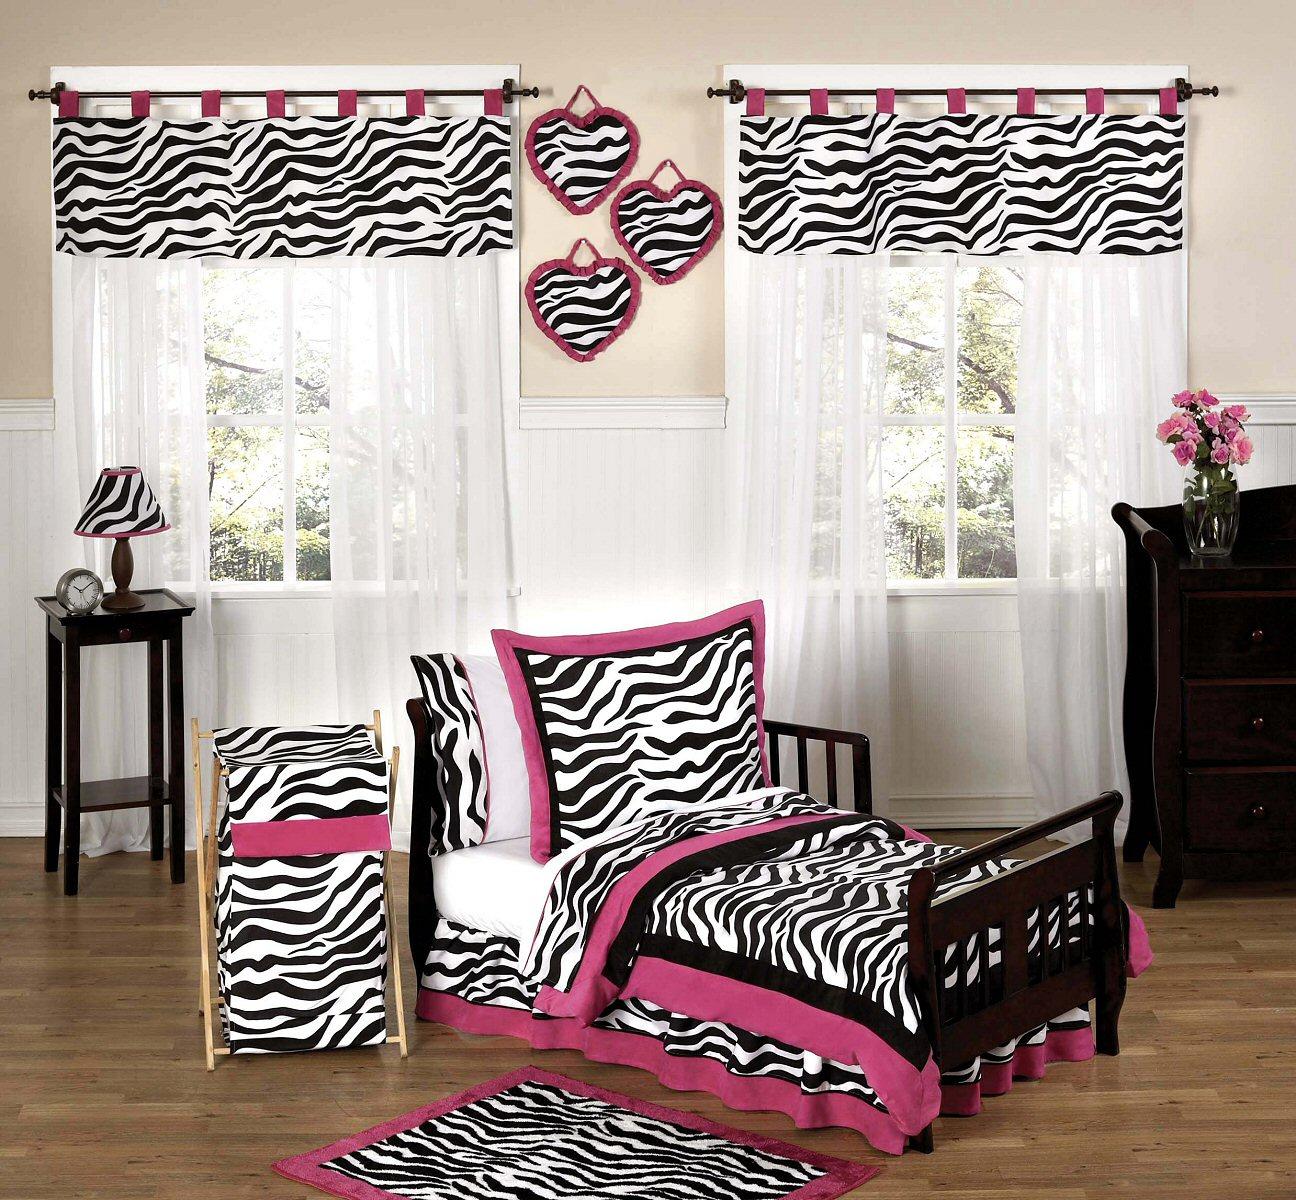 Pink and black zebra bedding 12 background wallpaper for Black and pink furniture